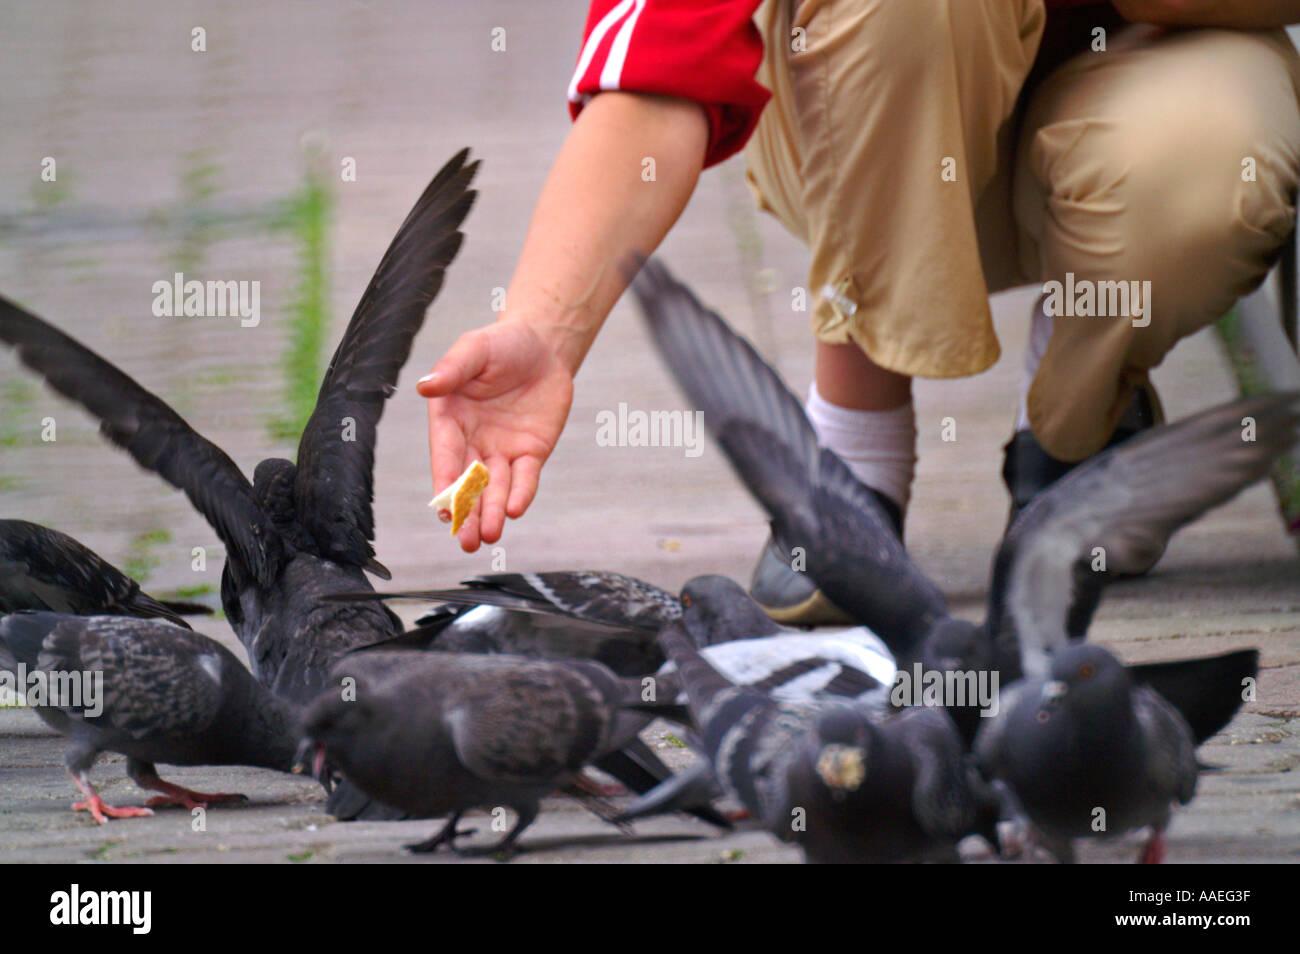 Hand Nourishing a Pigeon at street of Banska Bystrica, Slovakia Stock Photo